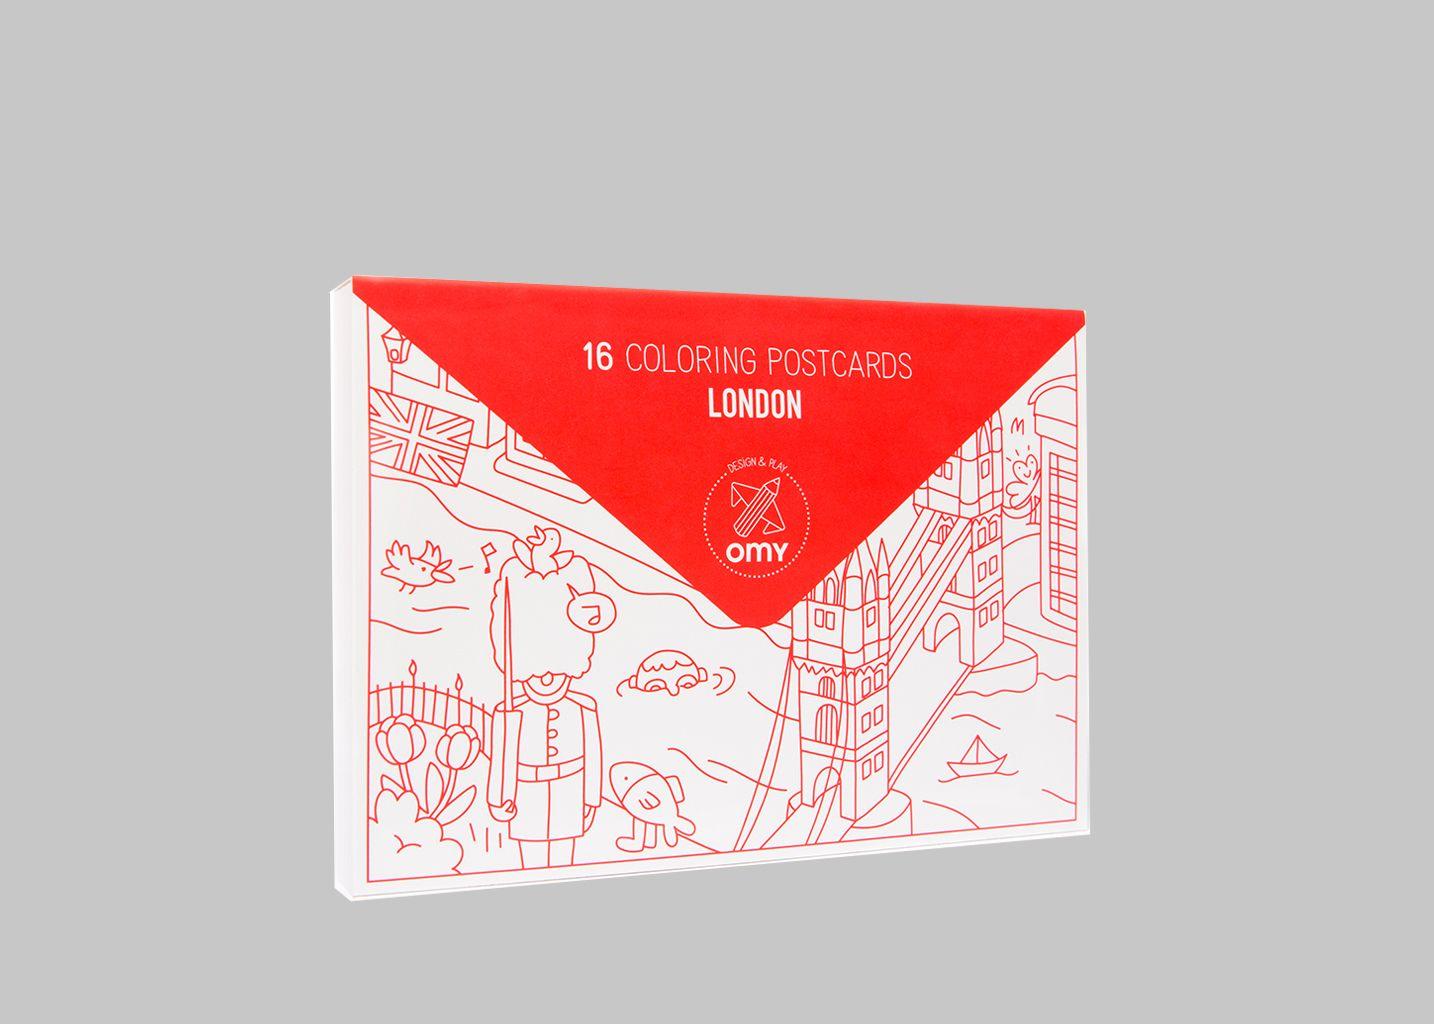 Cartes Postales London - Omy